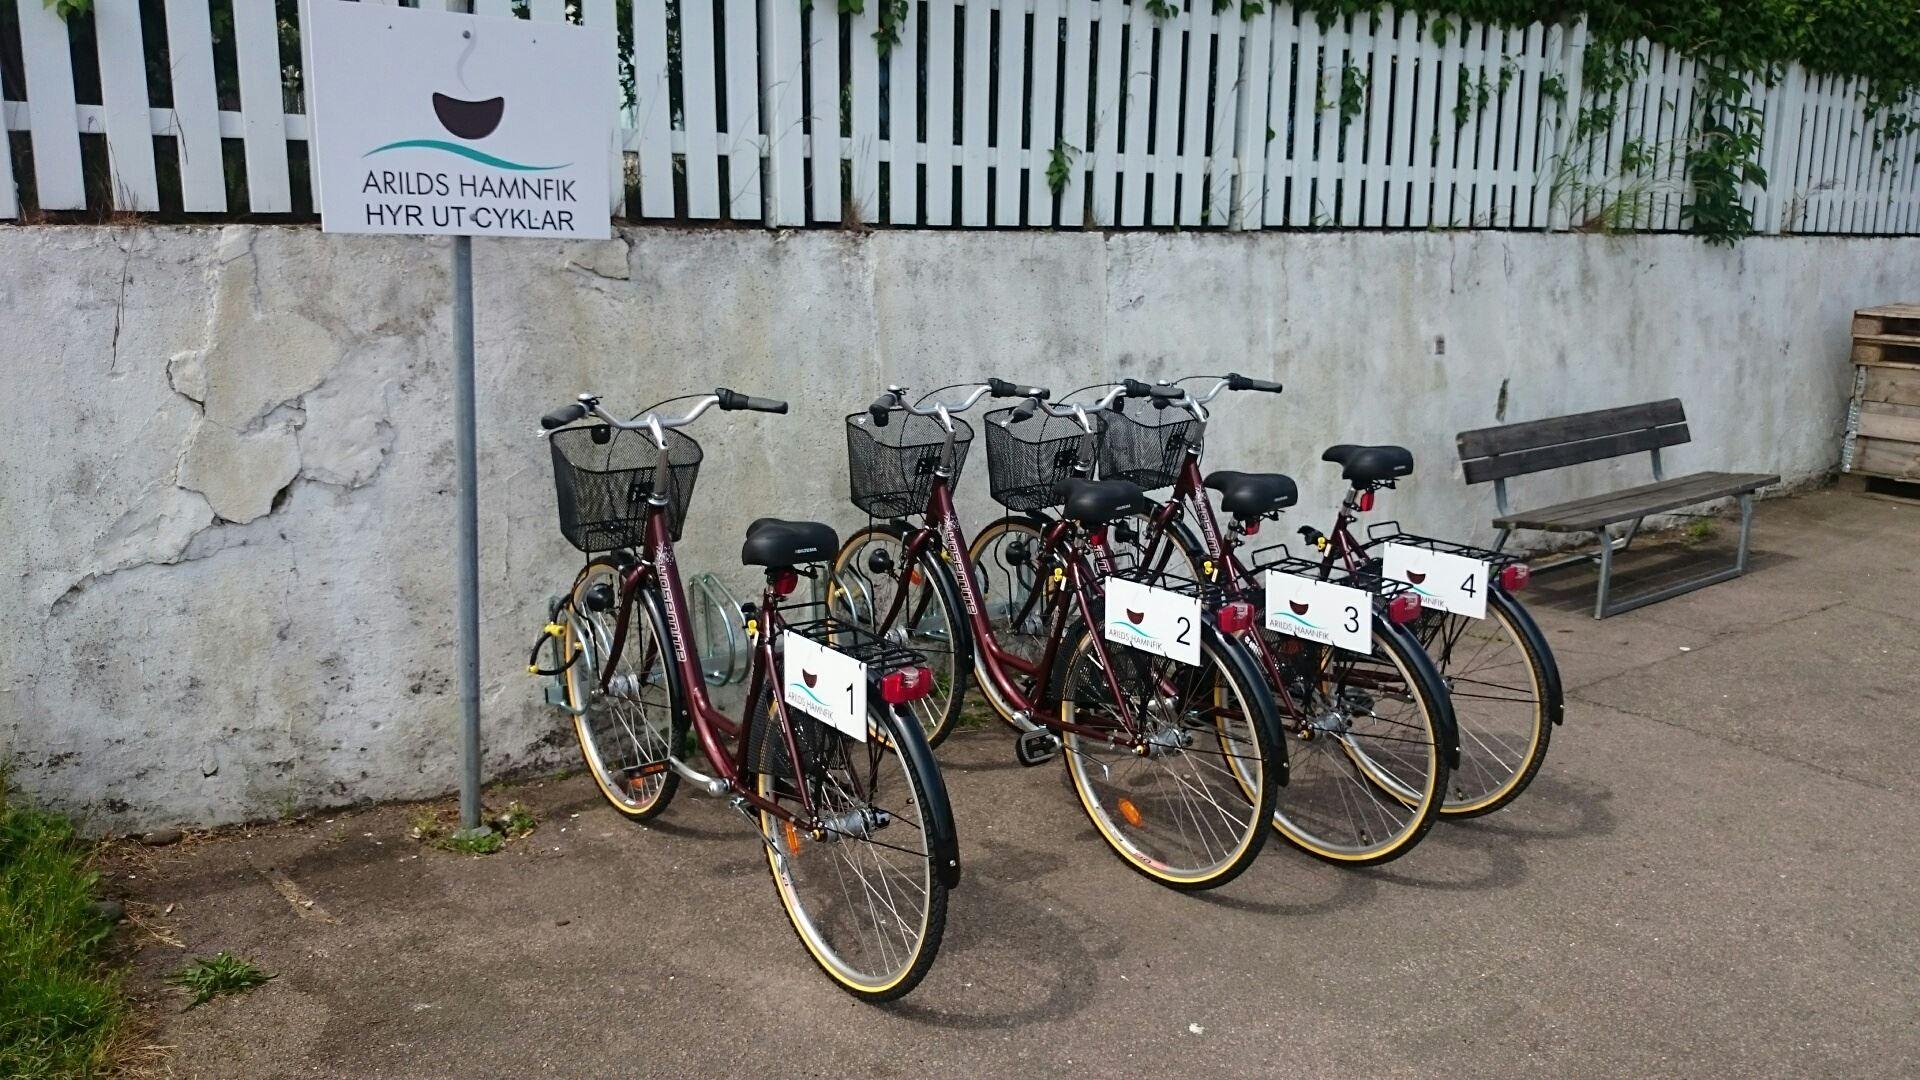 Cykeluthyrning vid Arilds Hamnfik